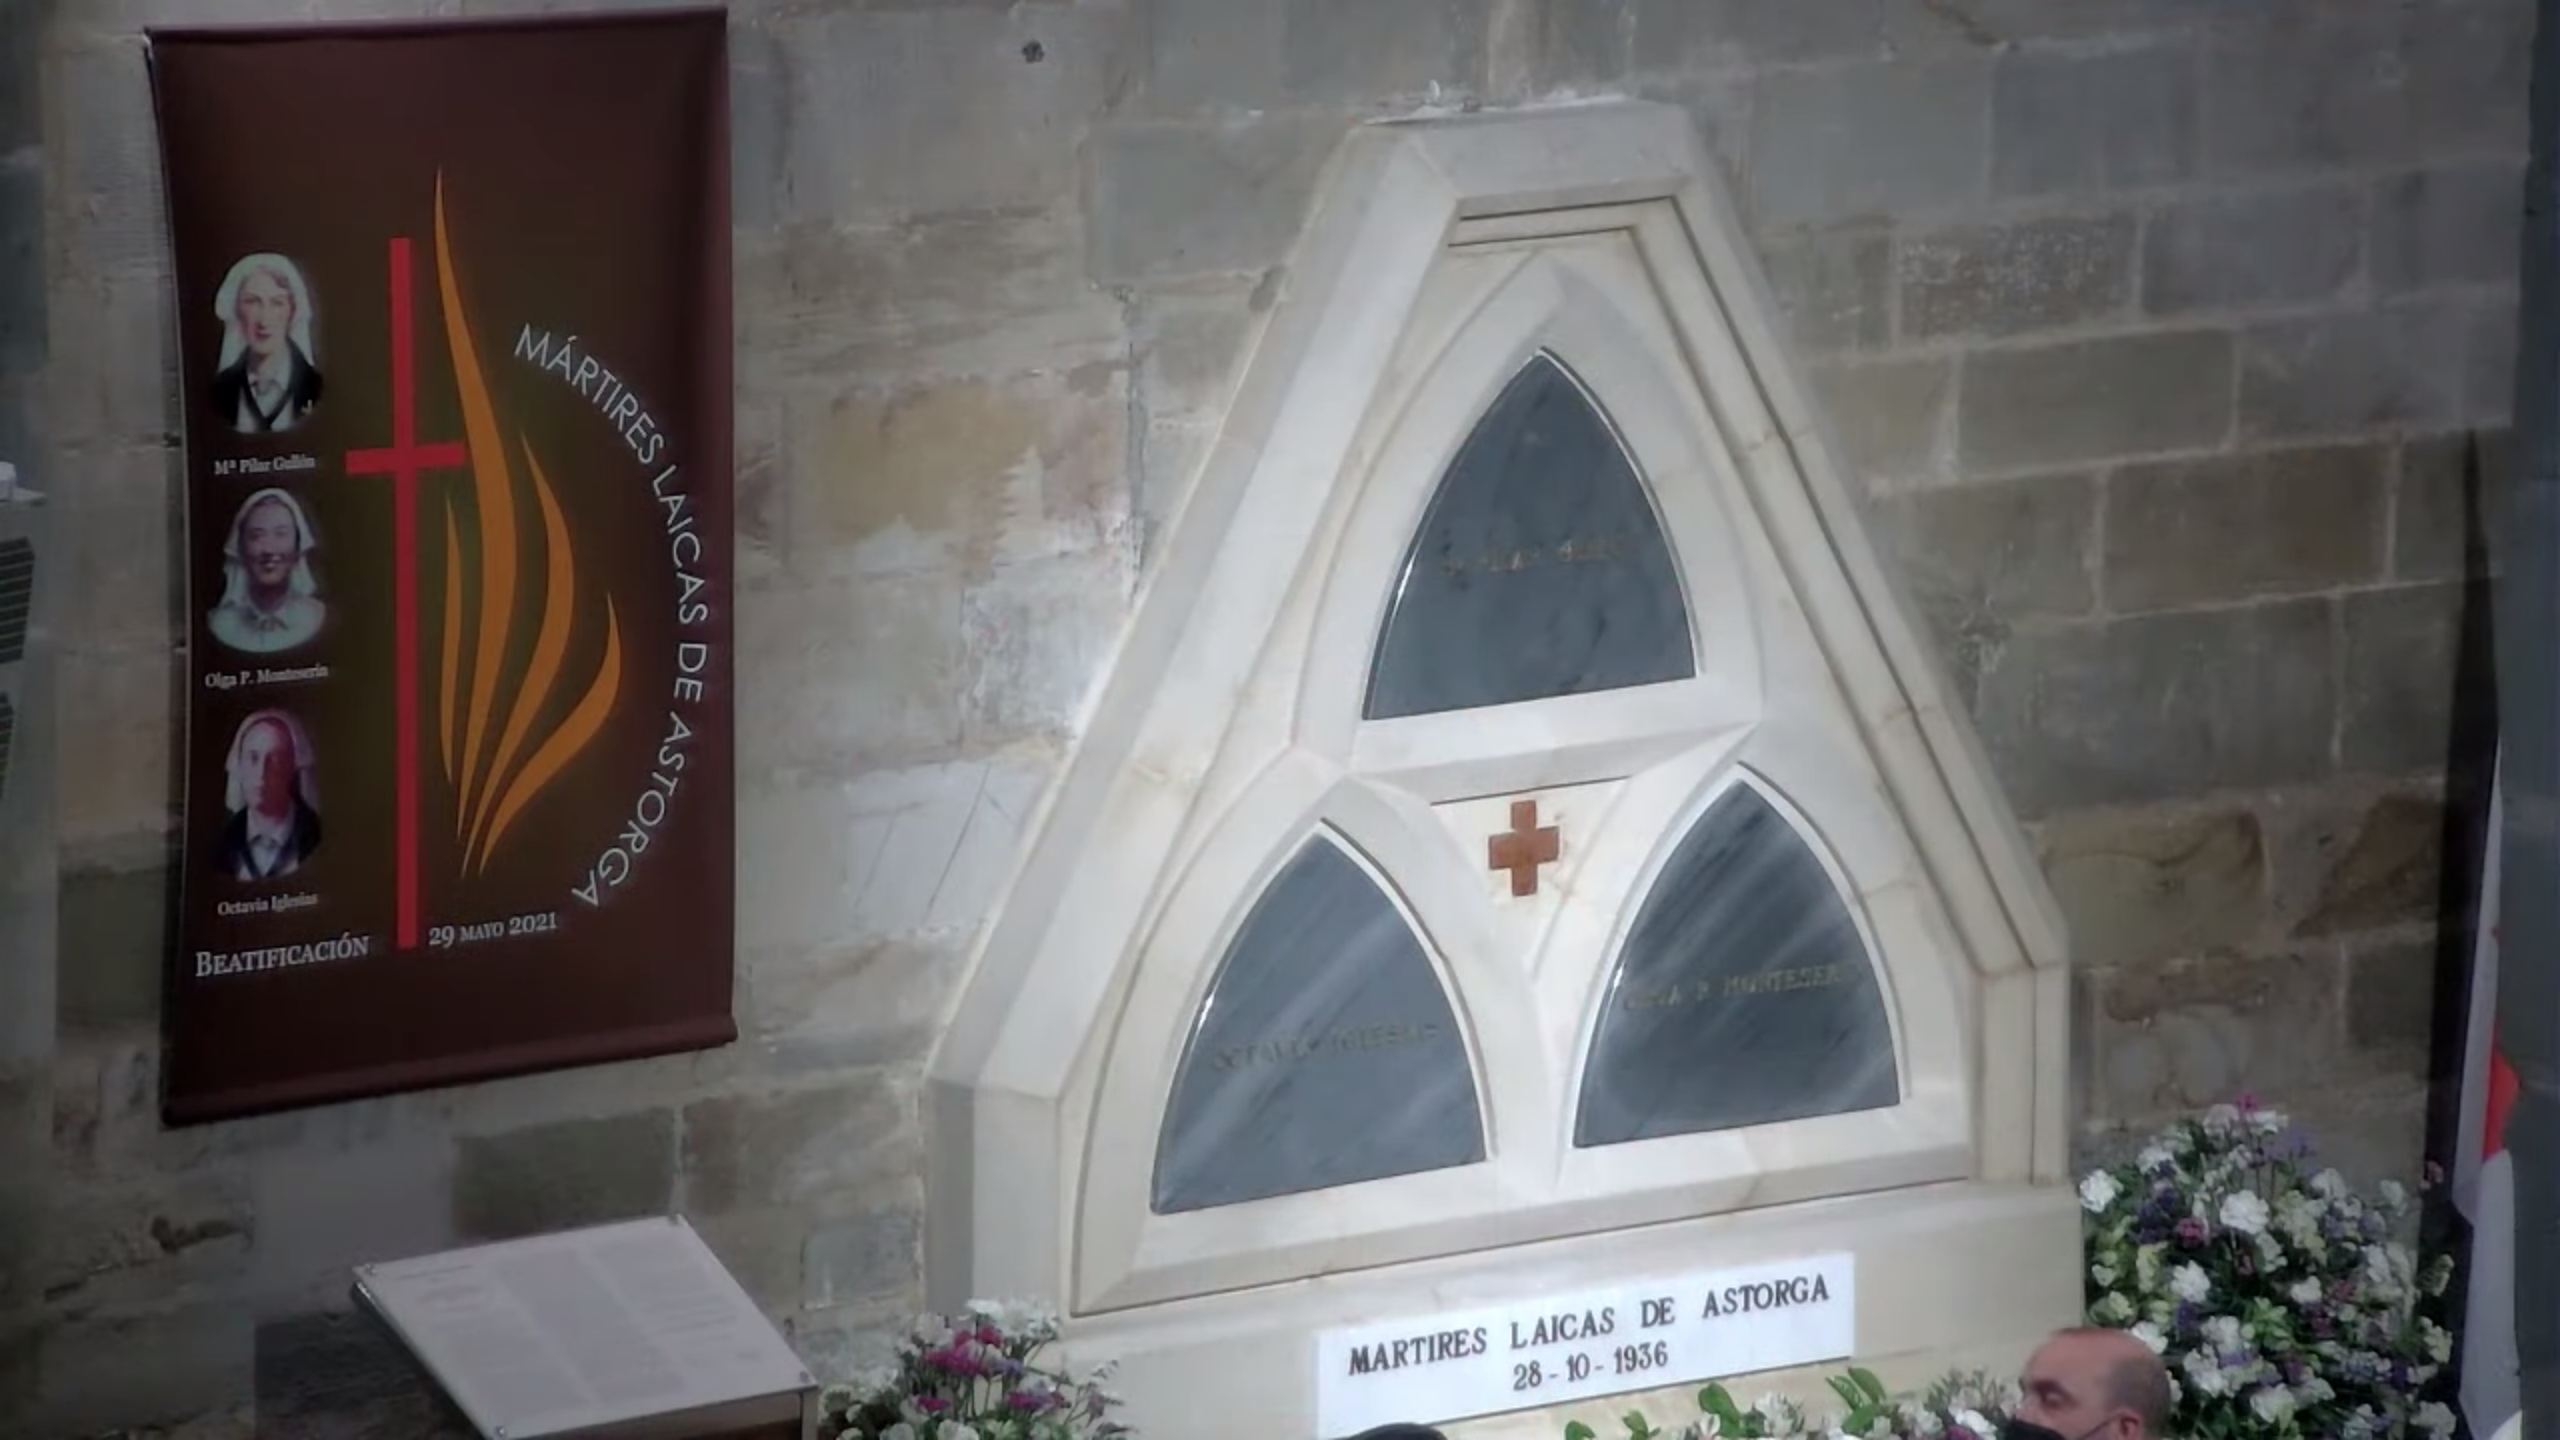 Estas son las tres mártires laicas beatificadas hoy en Astorga